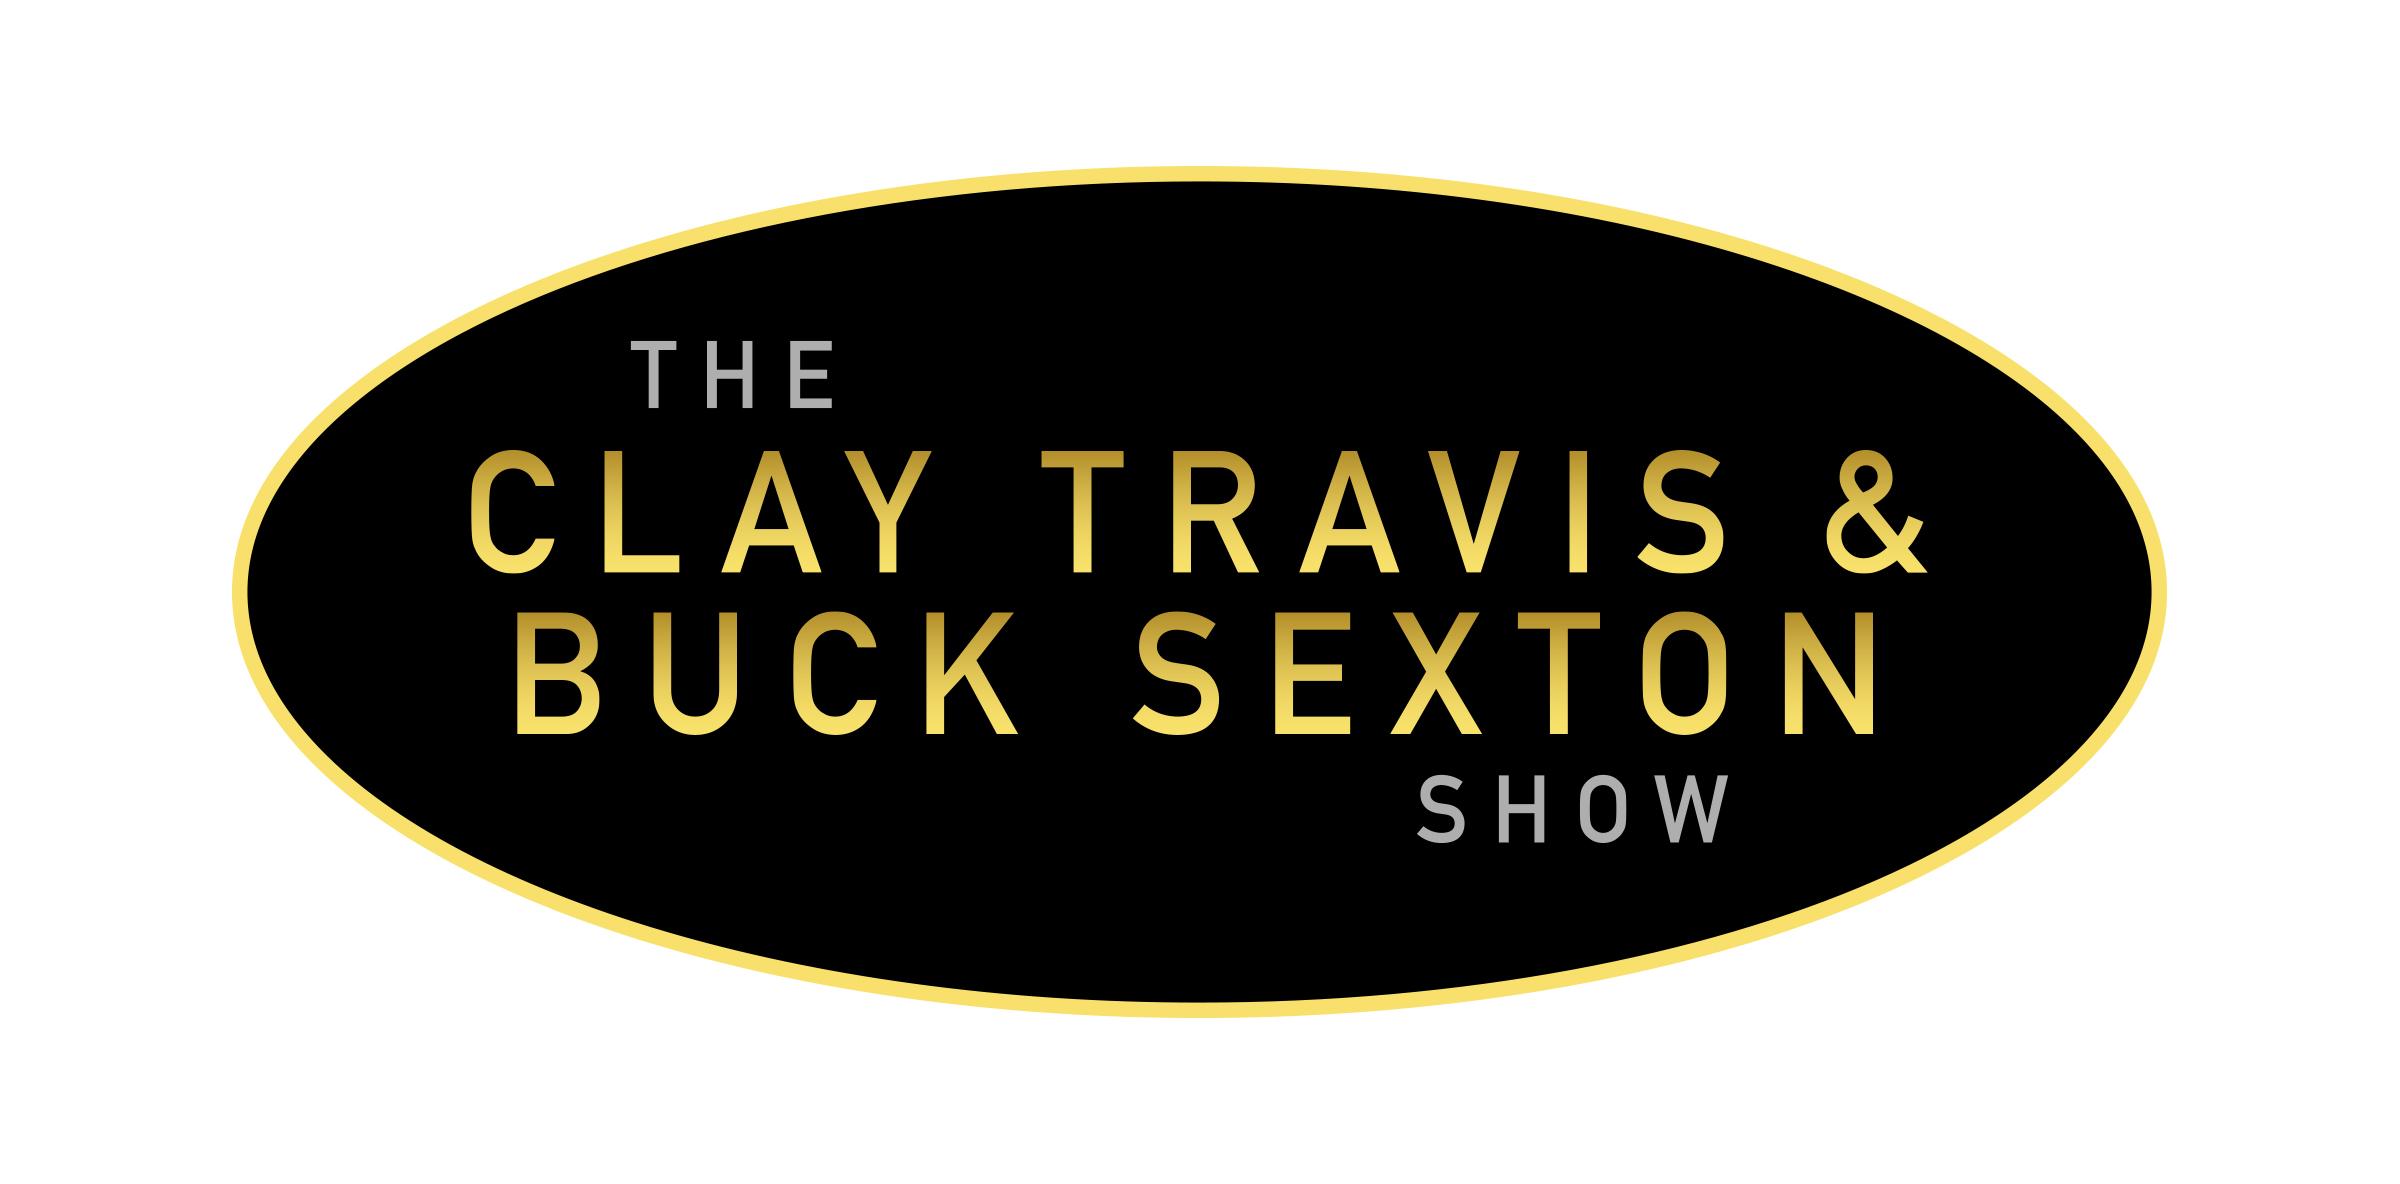 Clay Travis & Buck Sexton Show